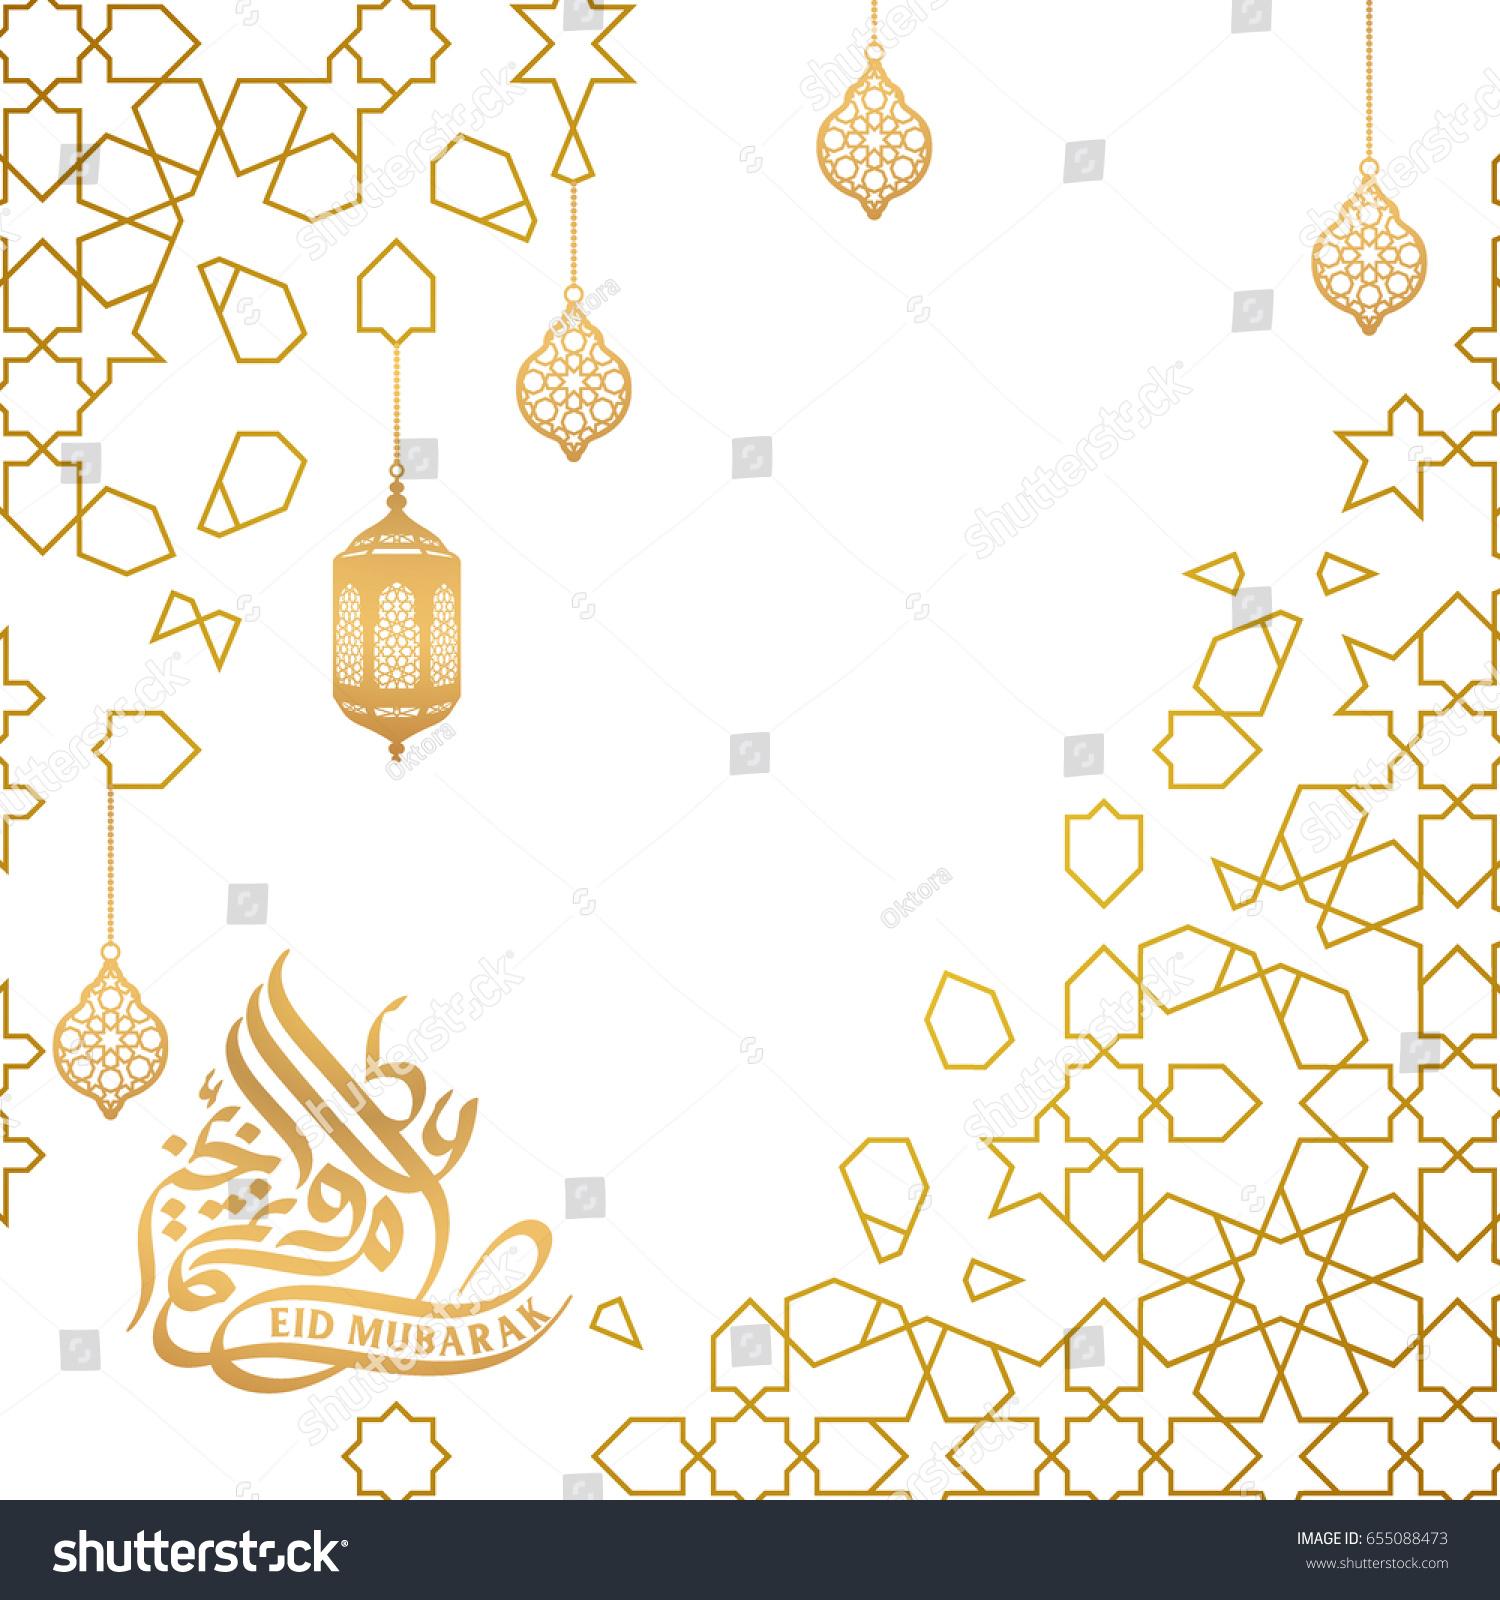 Eid Mubarak Greeting Islamic Background Arabic Stock Vector Royalty